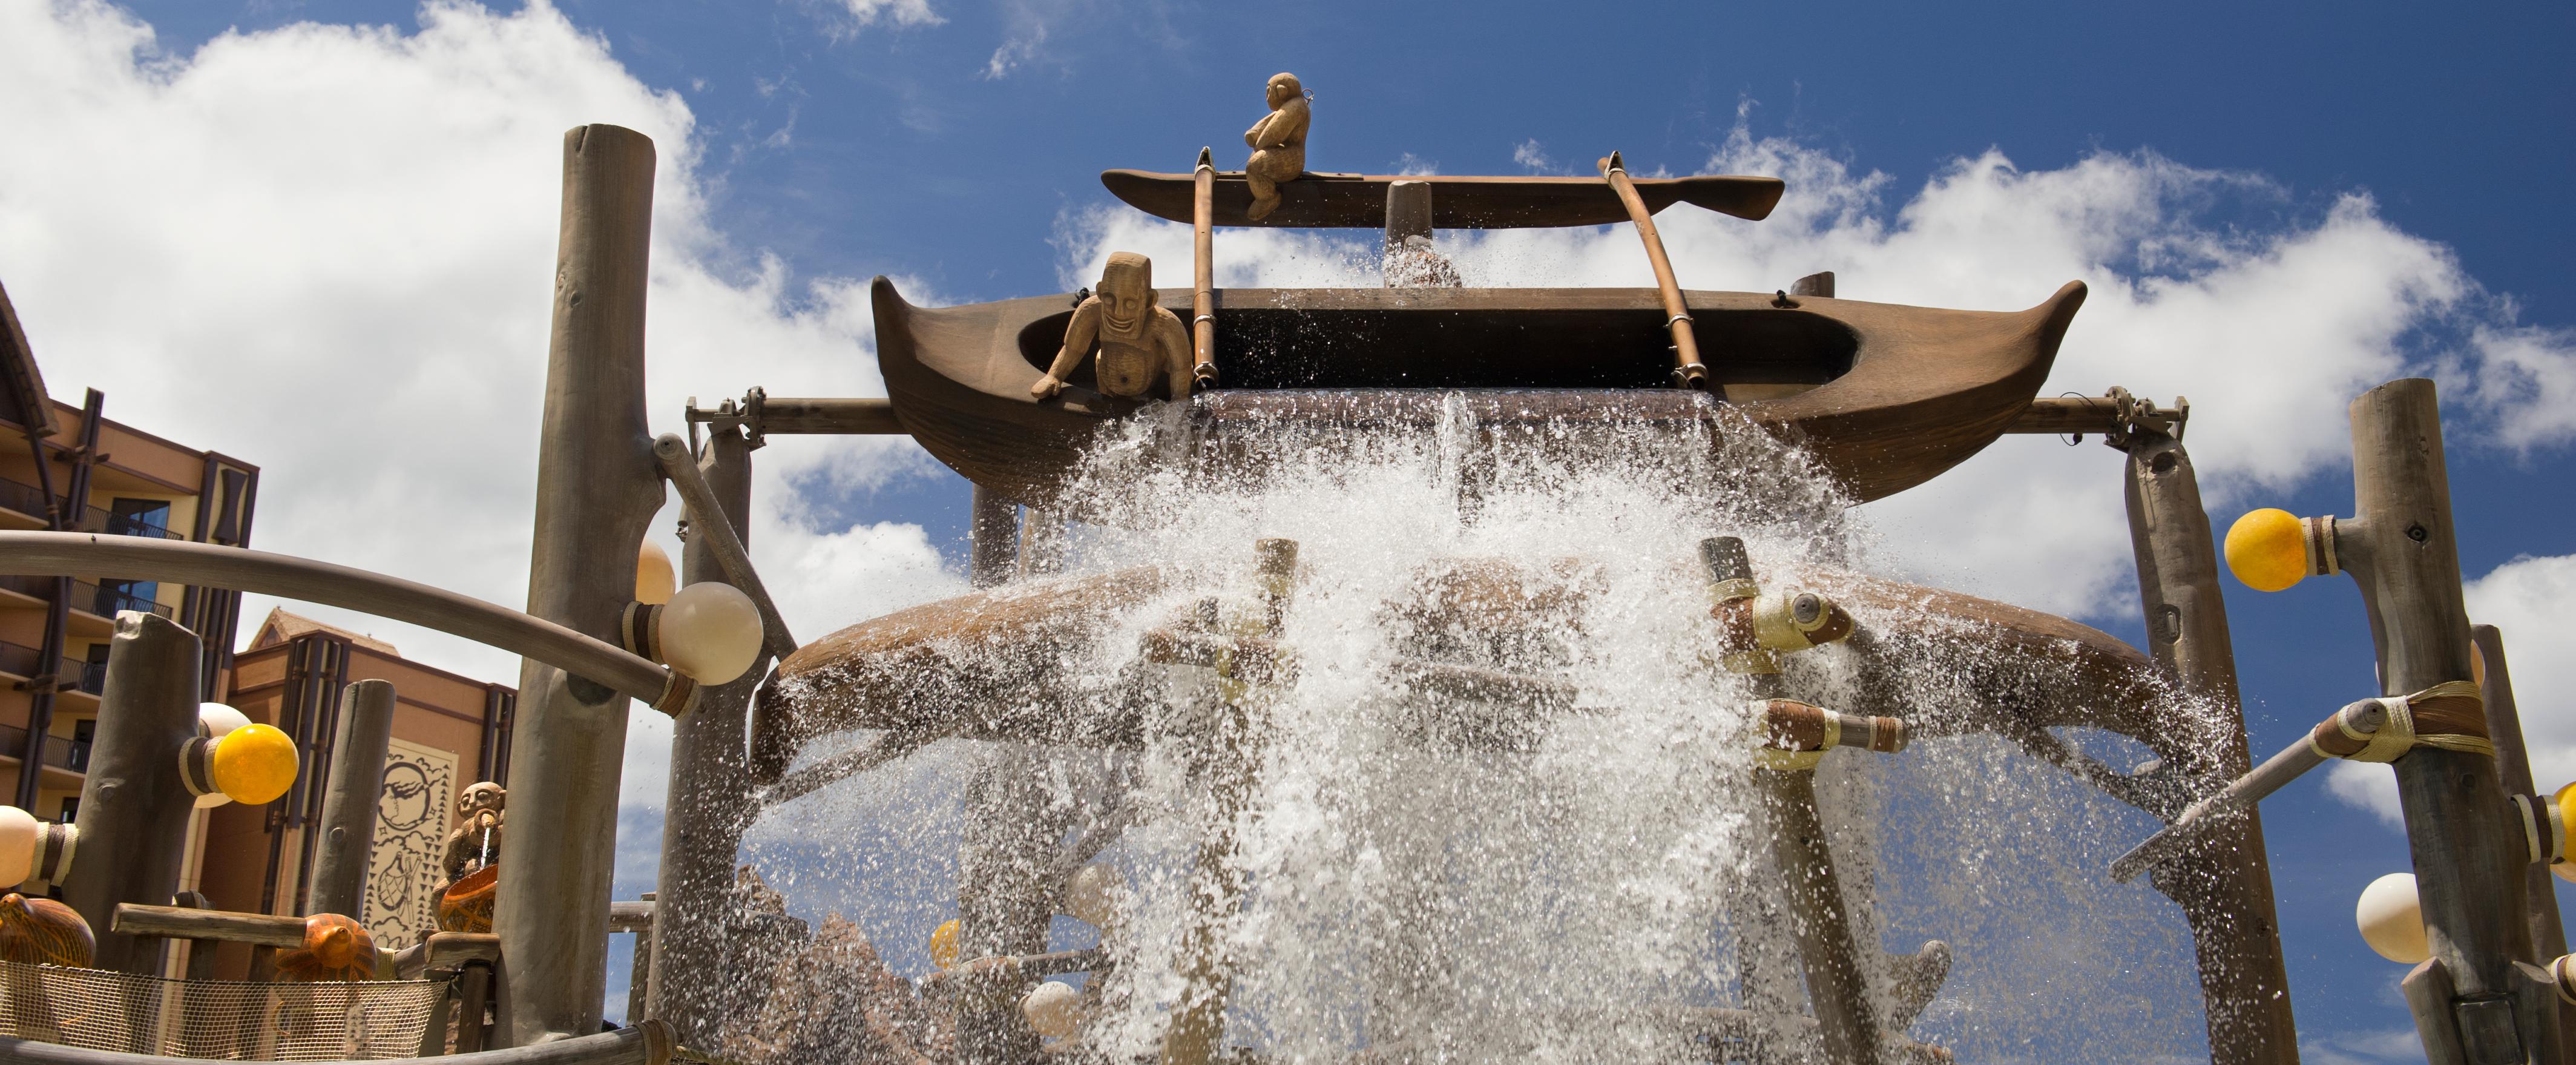 Water cascading down Menehune Bridge